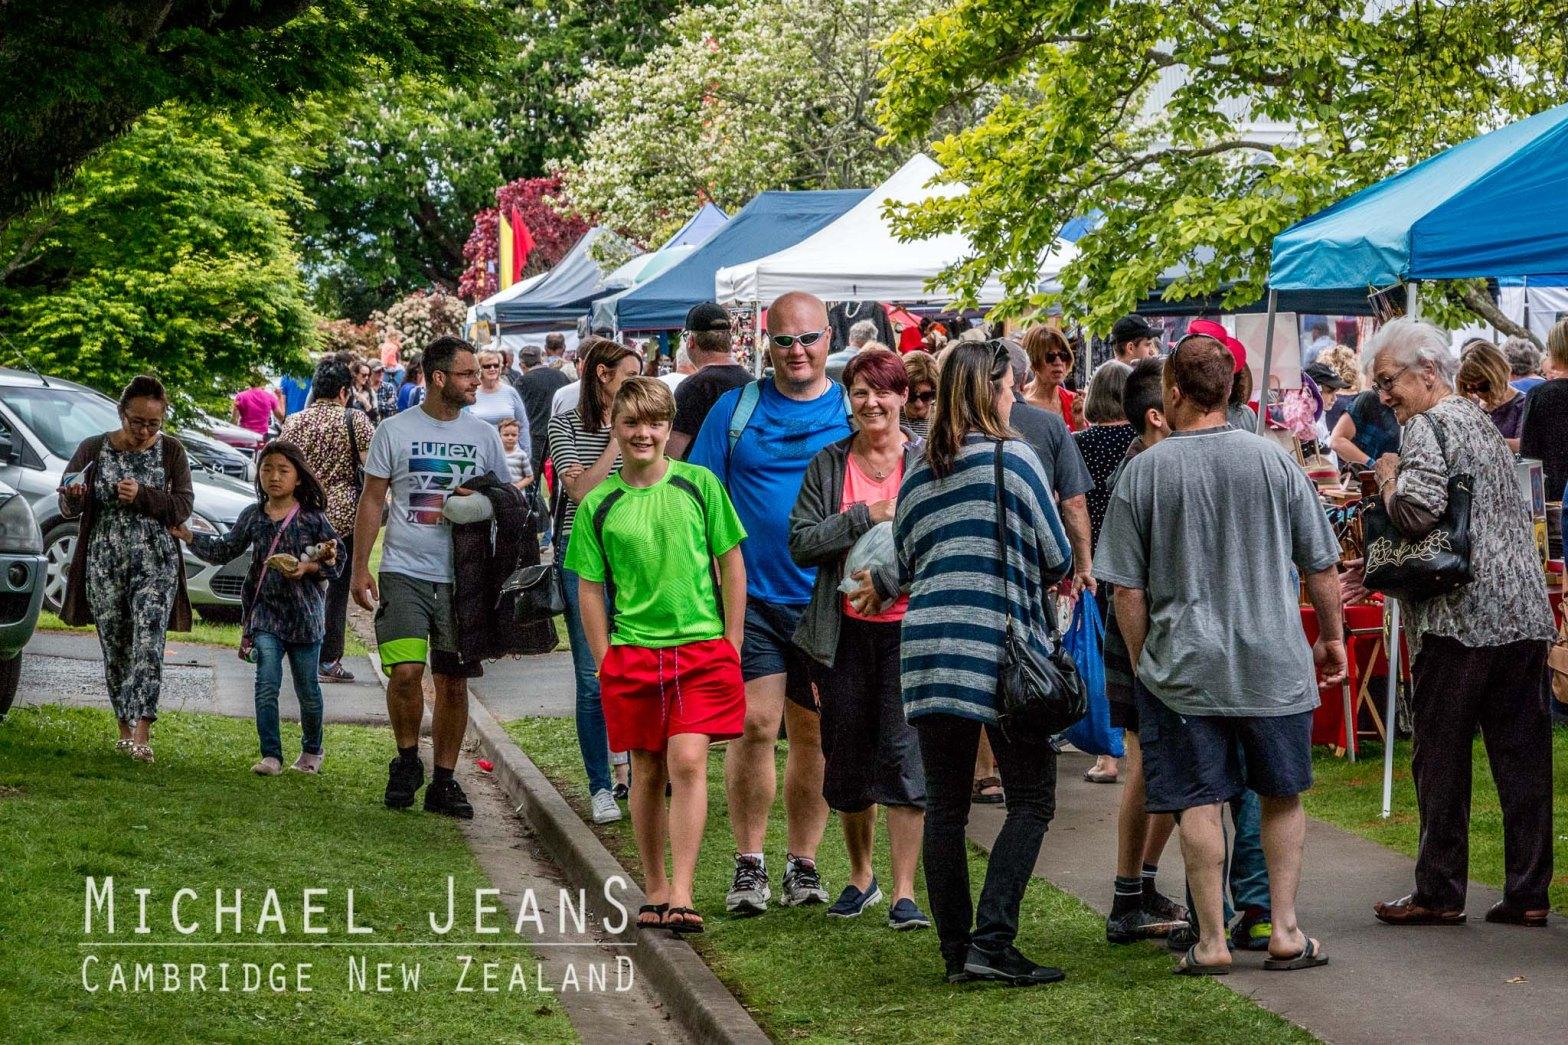 St Andrews Craft Fair Cambridge NZ October 2016